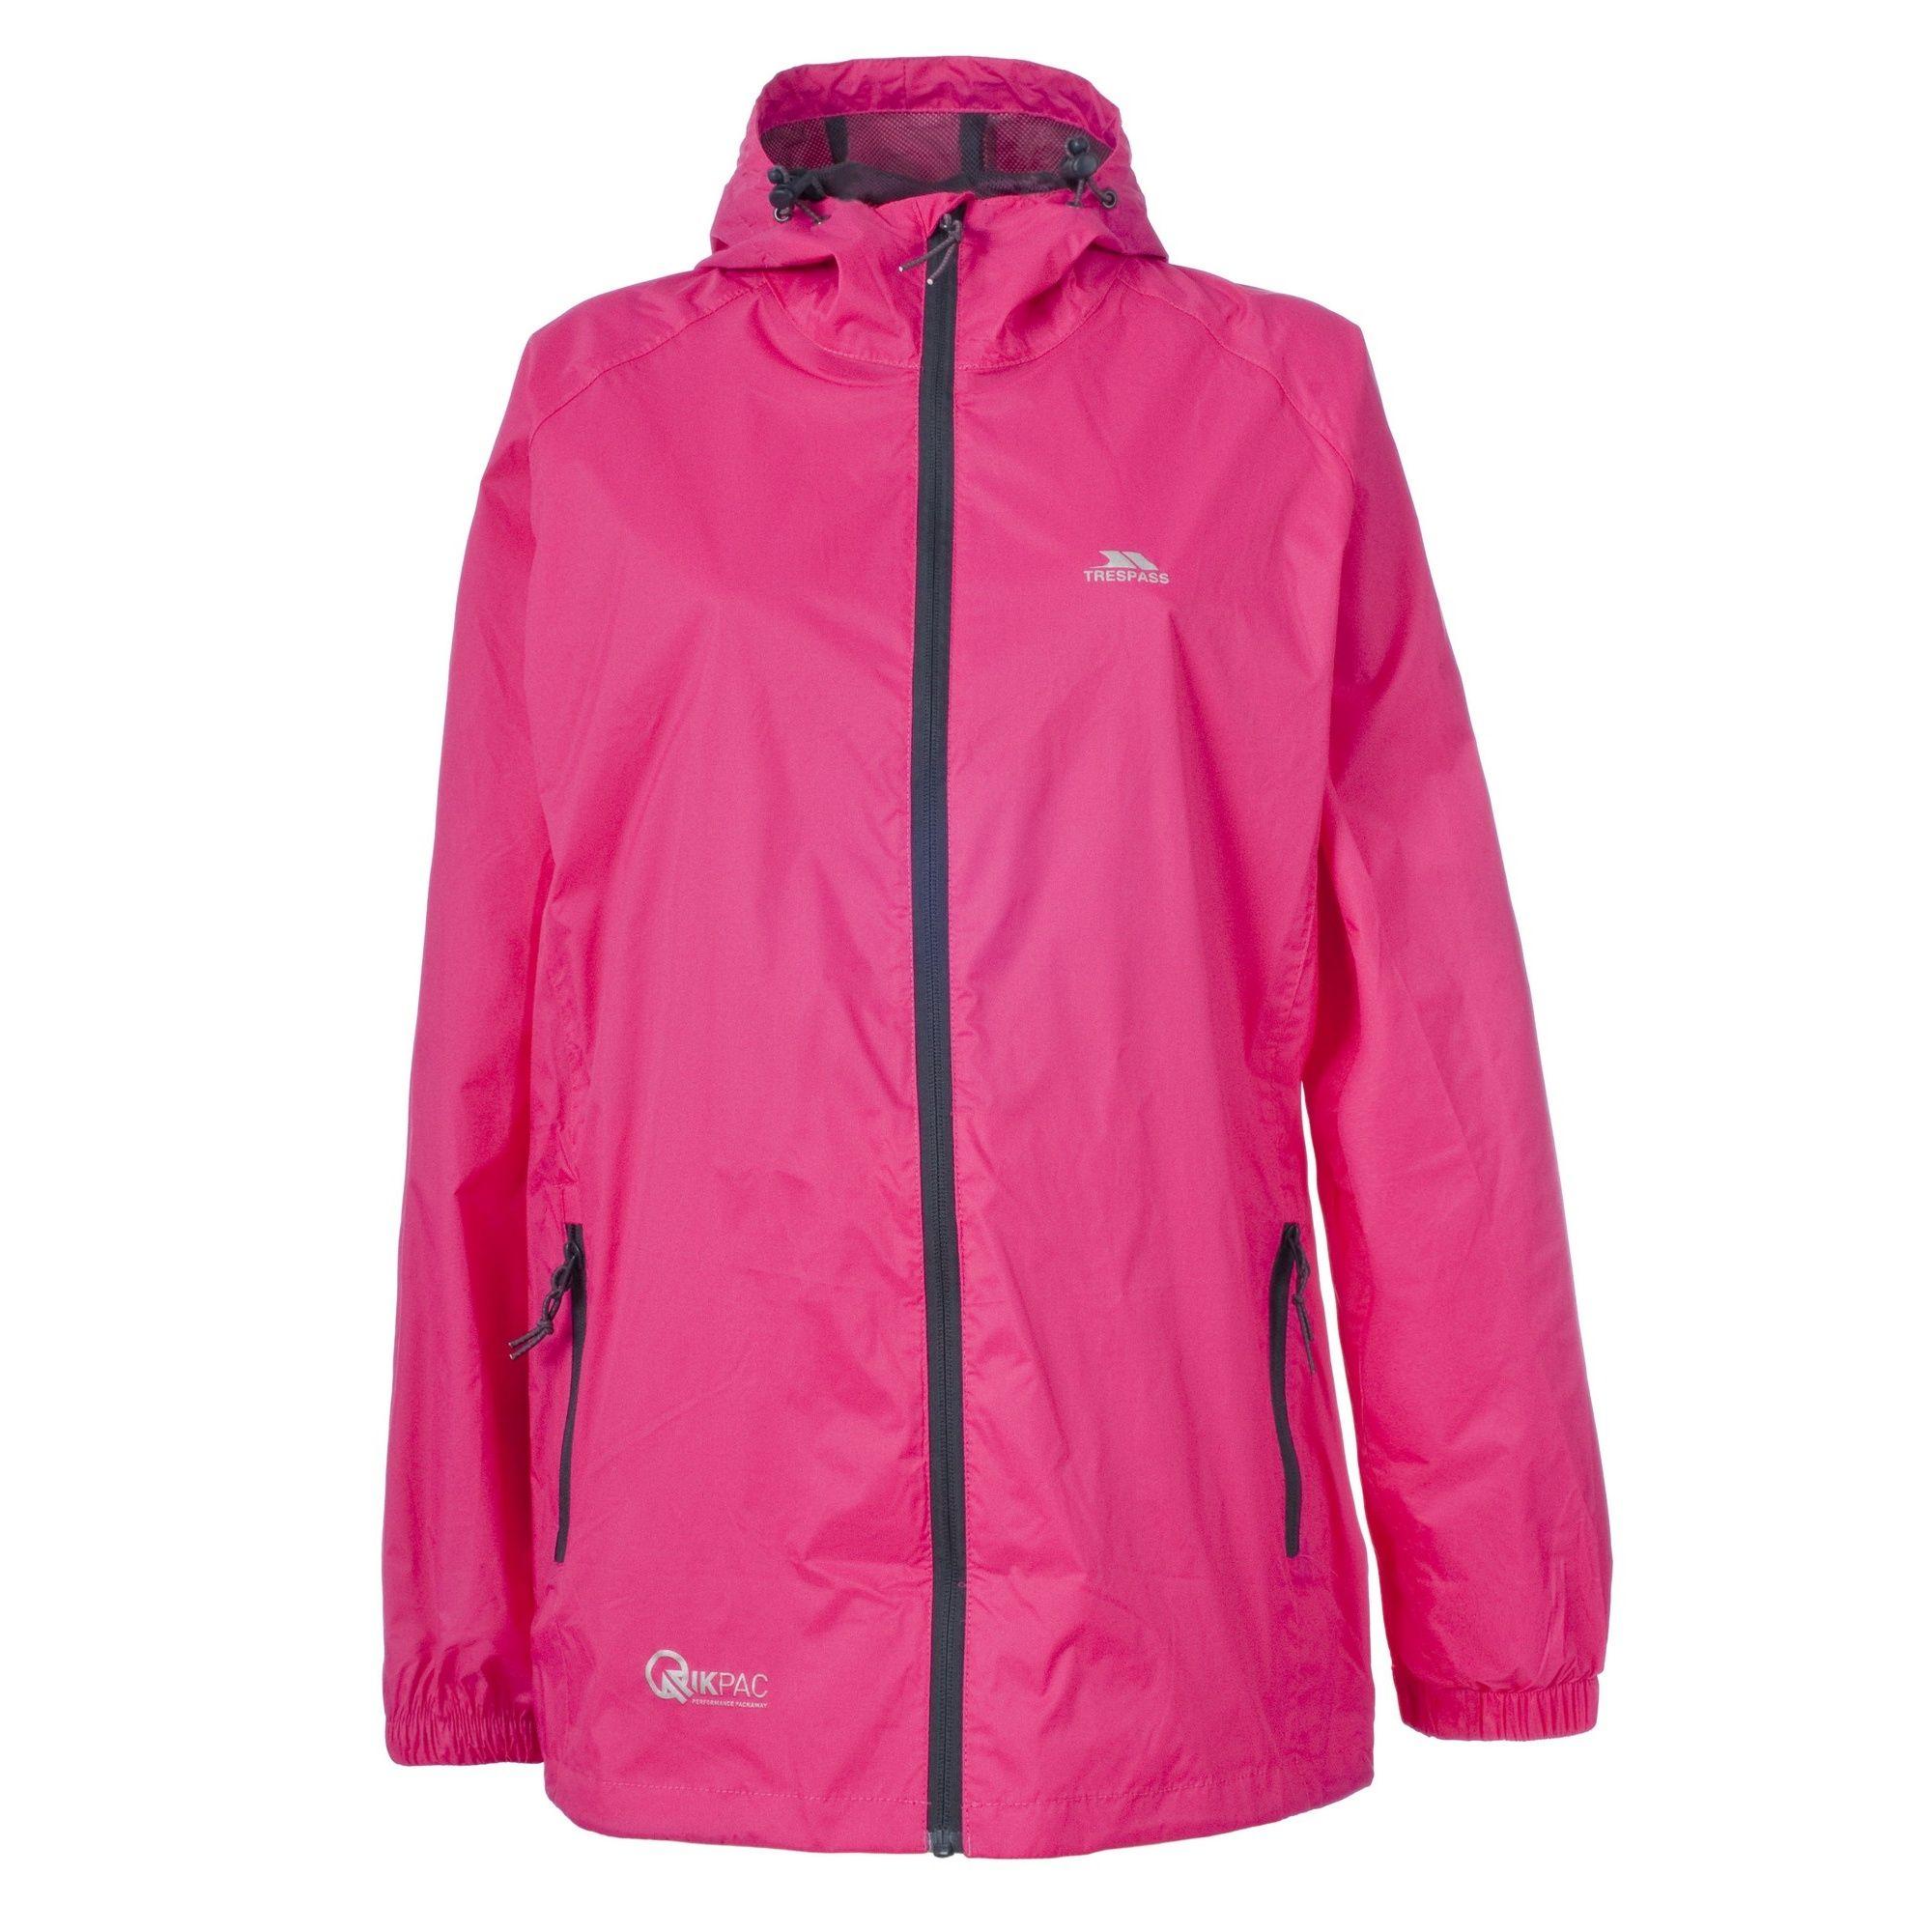 Trespass Adults Unisex Qikpac Packaway Waterproof Jacket